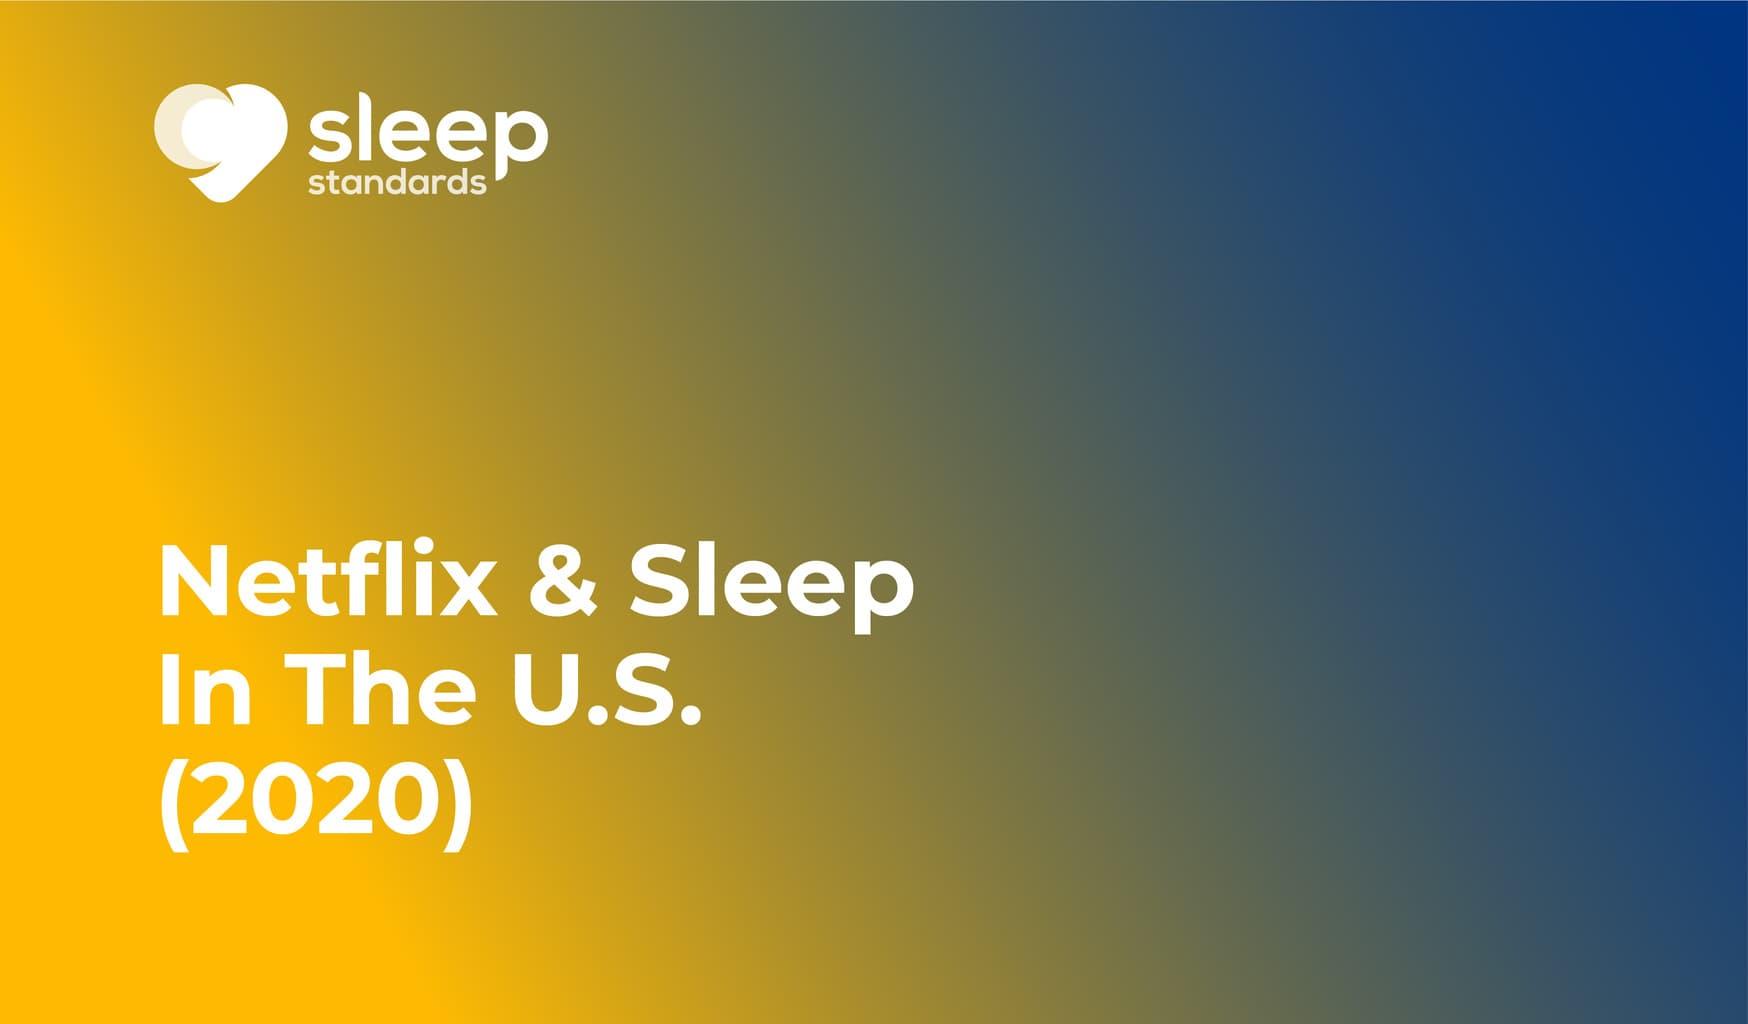 Netflix and Sleep In The U.S. 2020